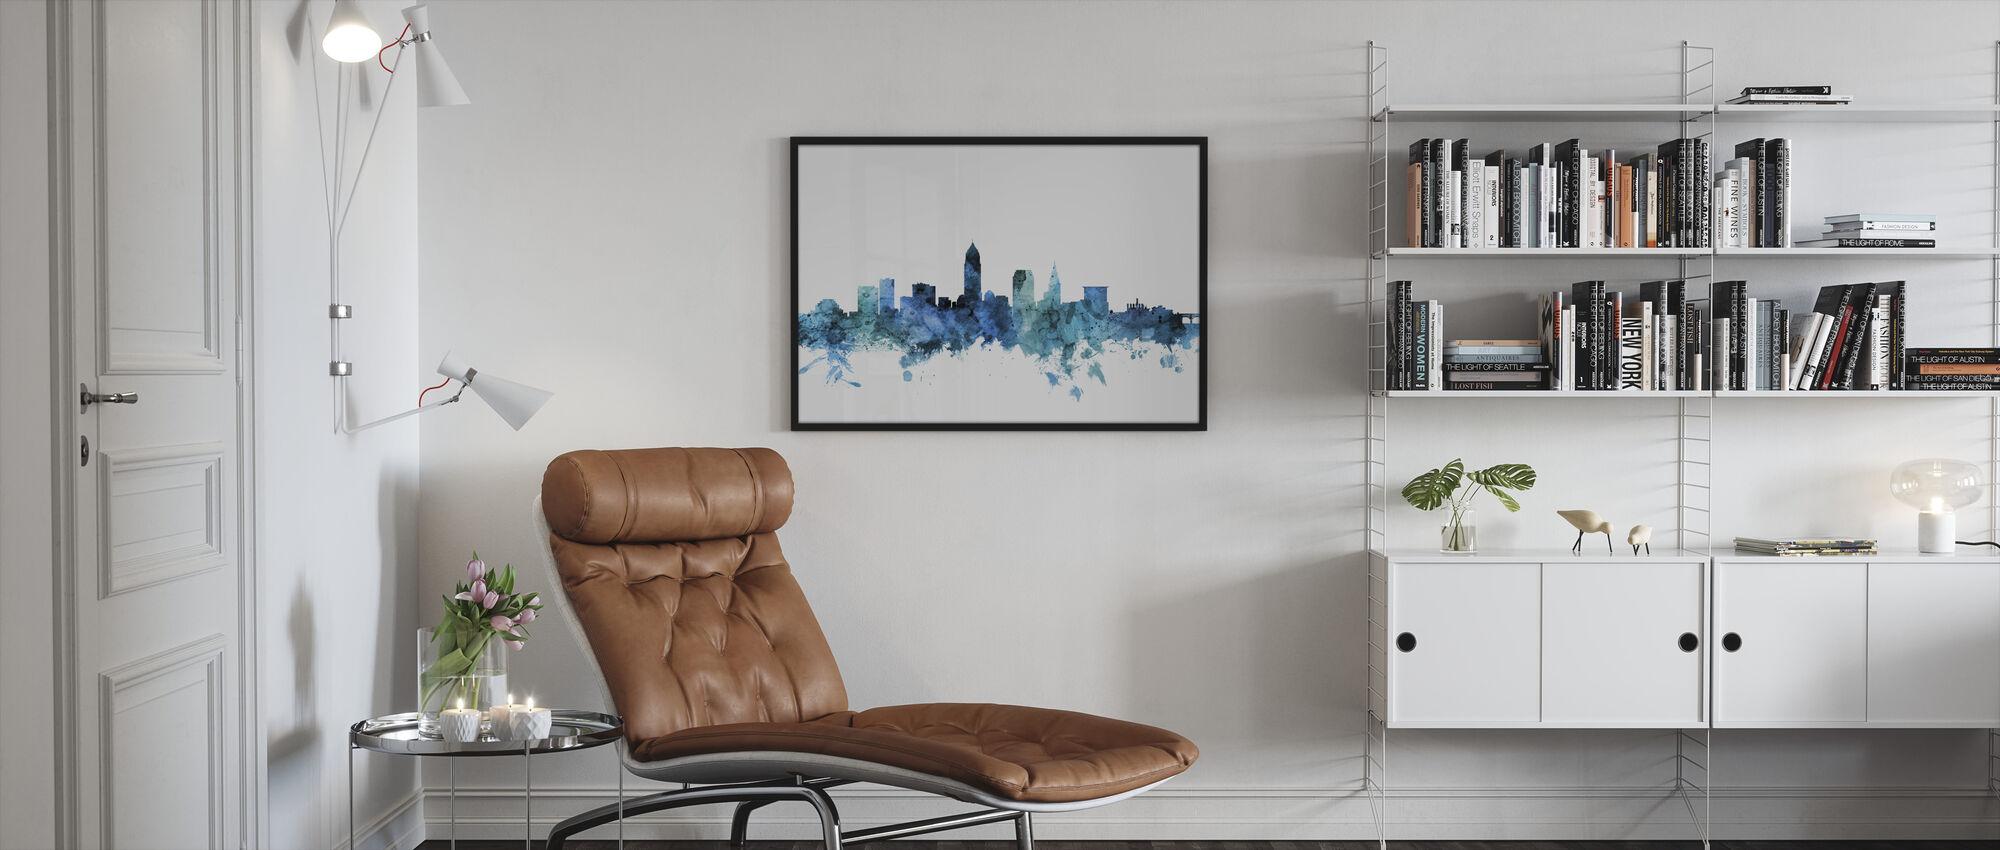 Cleveland Ohio Skyline - Framed print - Living Room